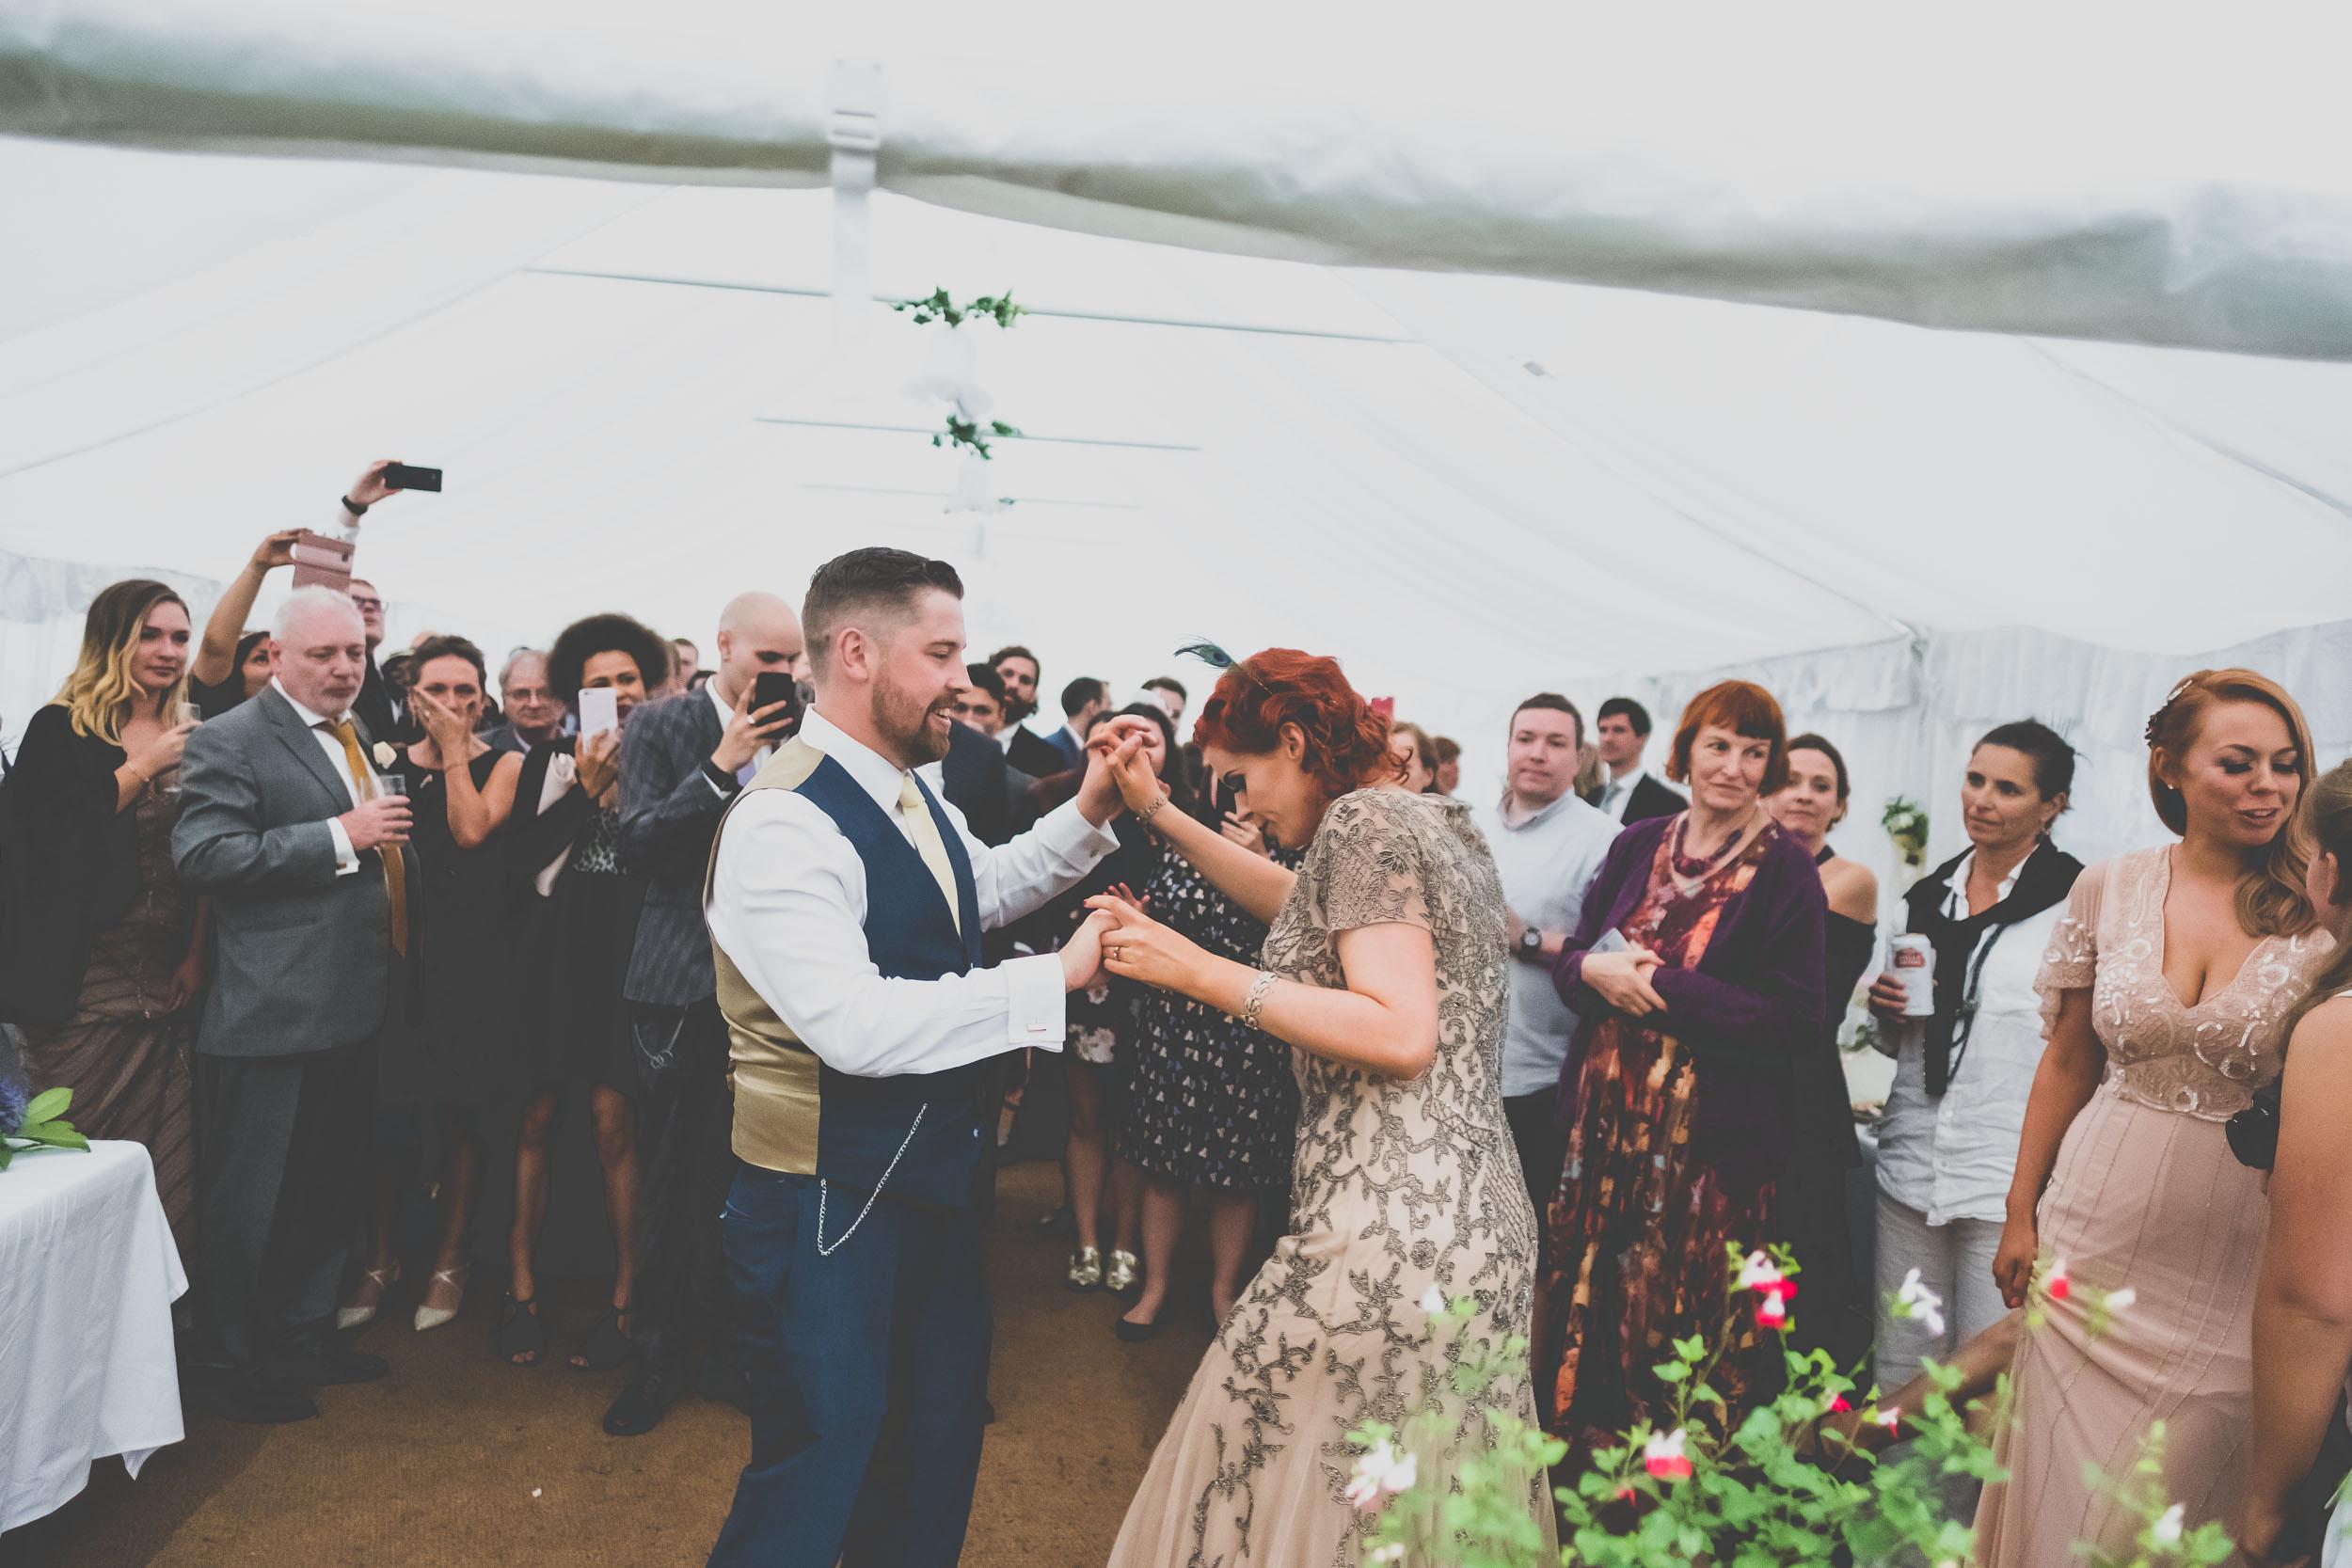 queen-elizabeths-hunting-lodge-epping-forest-wedding400.jpg